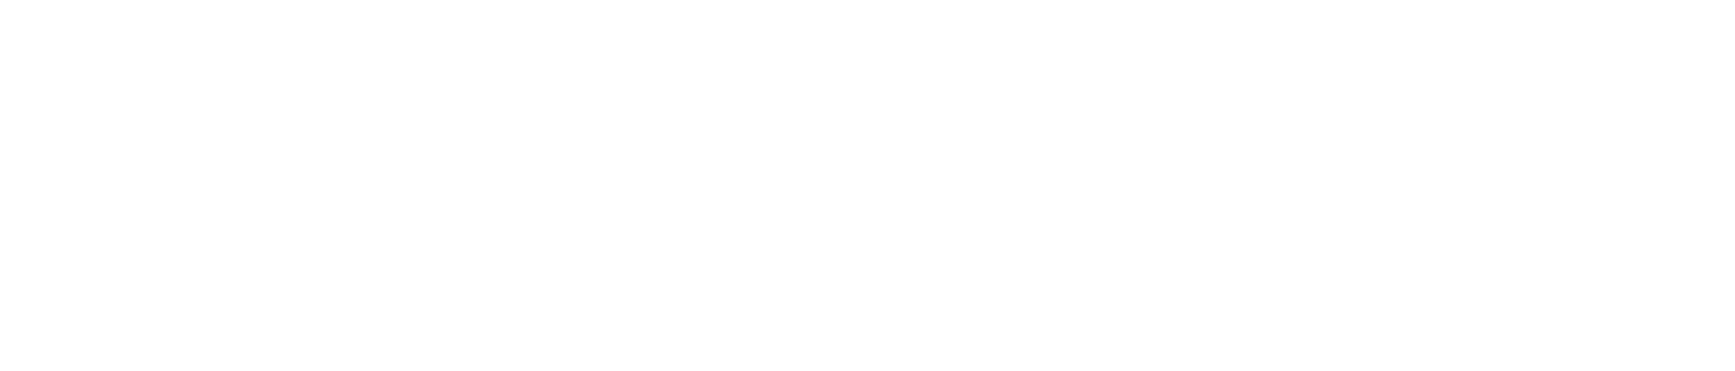 Labayk logo